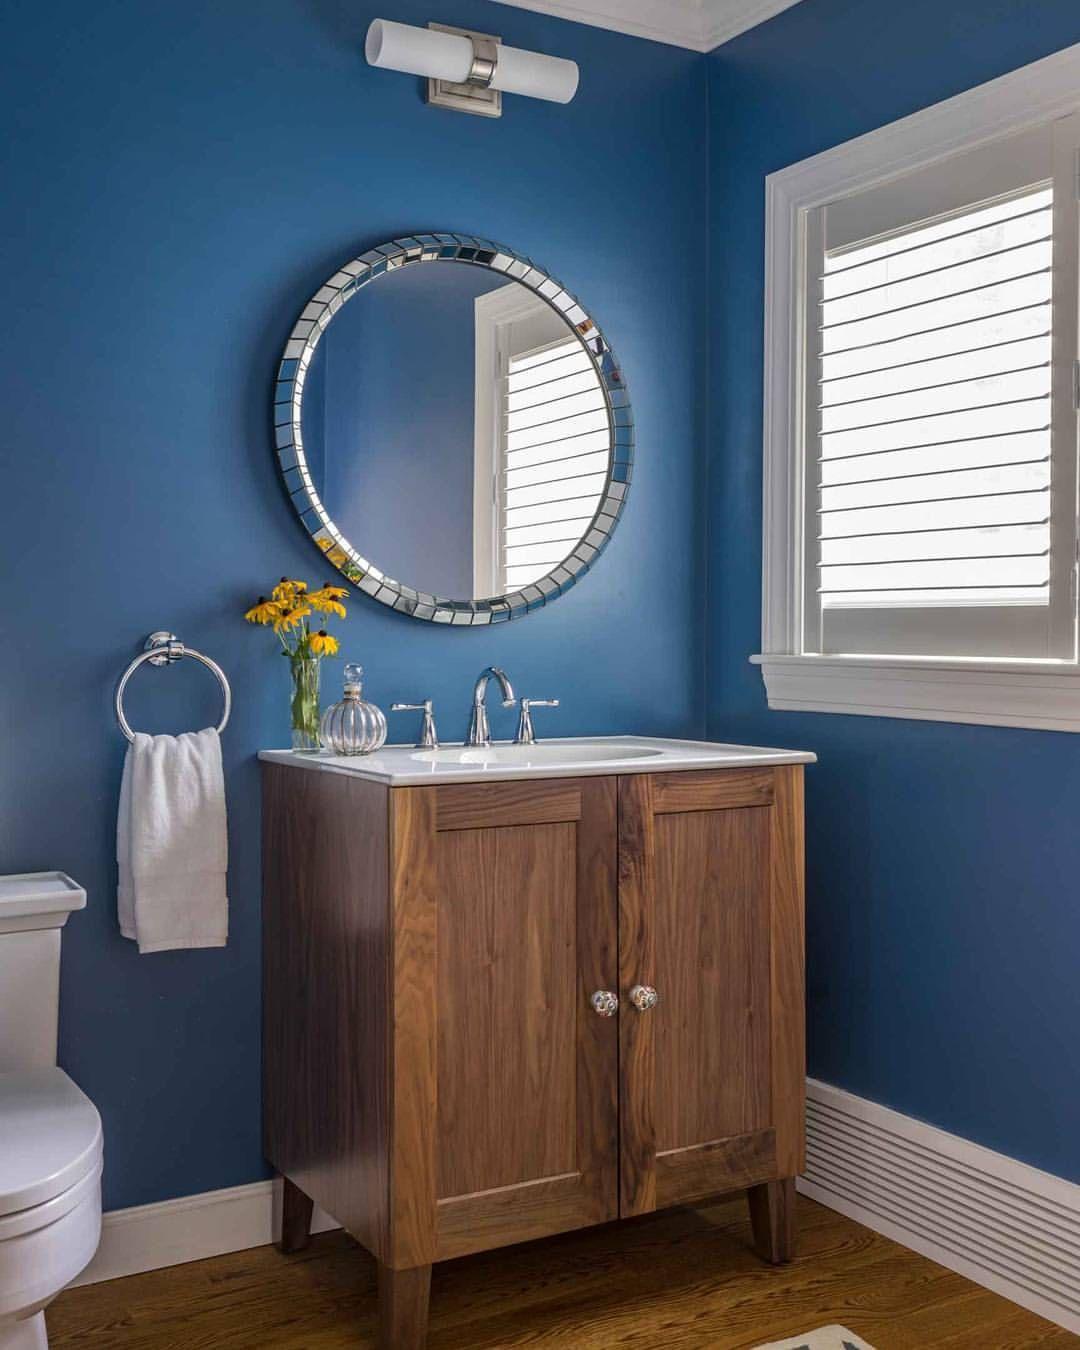 When you find the right blue! #bluewalls #powderbath #interiordesign ...